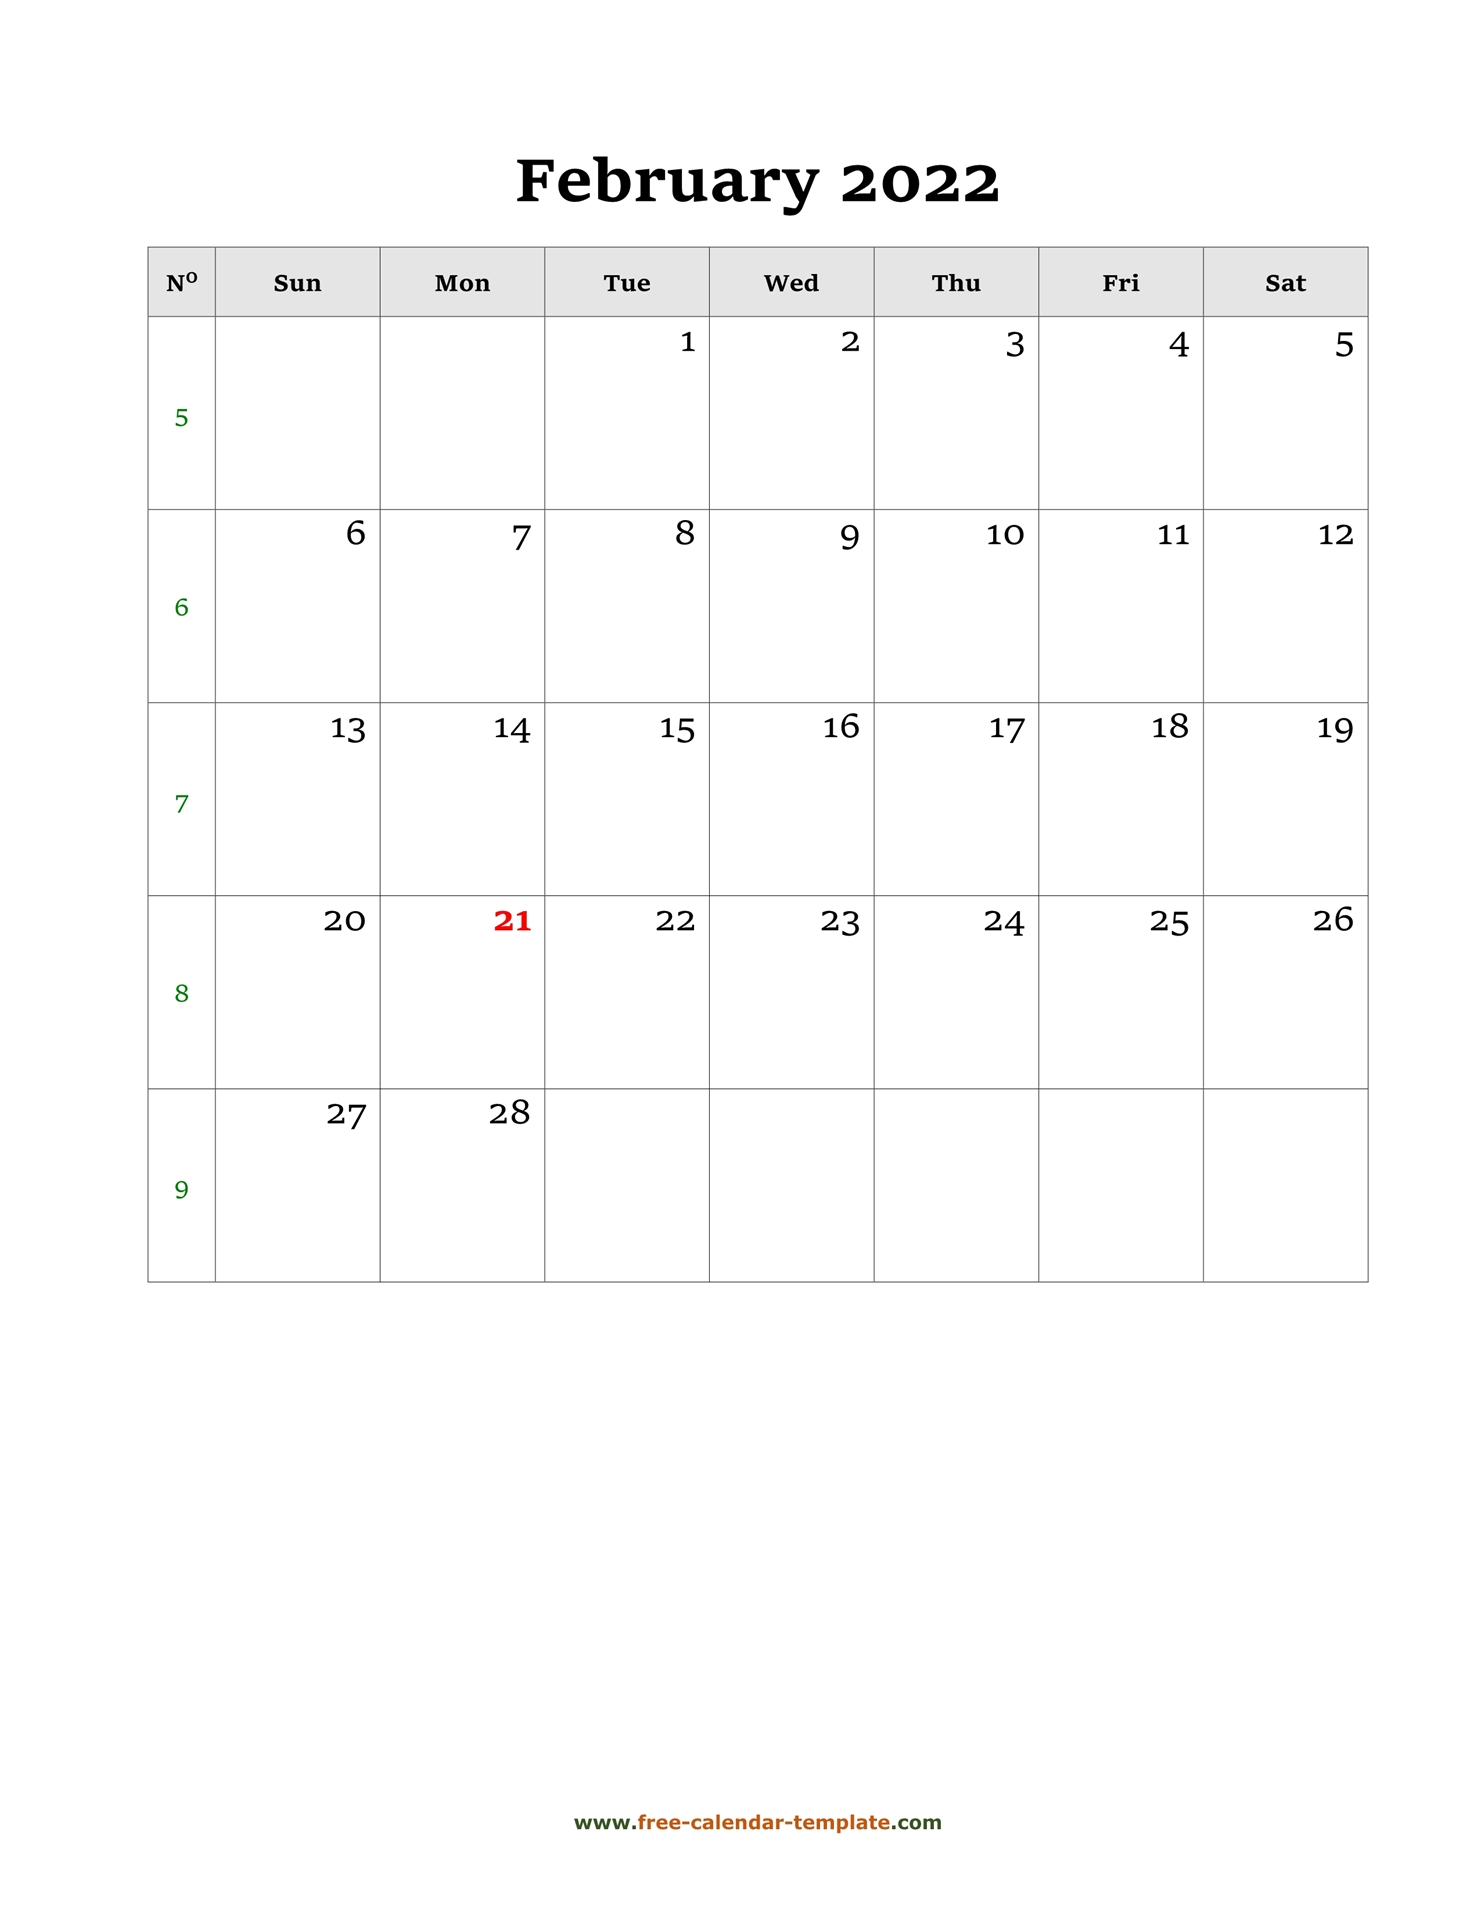 February Calendar 2022 Simple Design With Large Box On regarding February 2022 Calendar Template